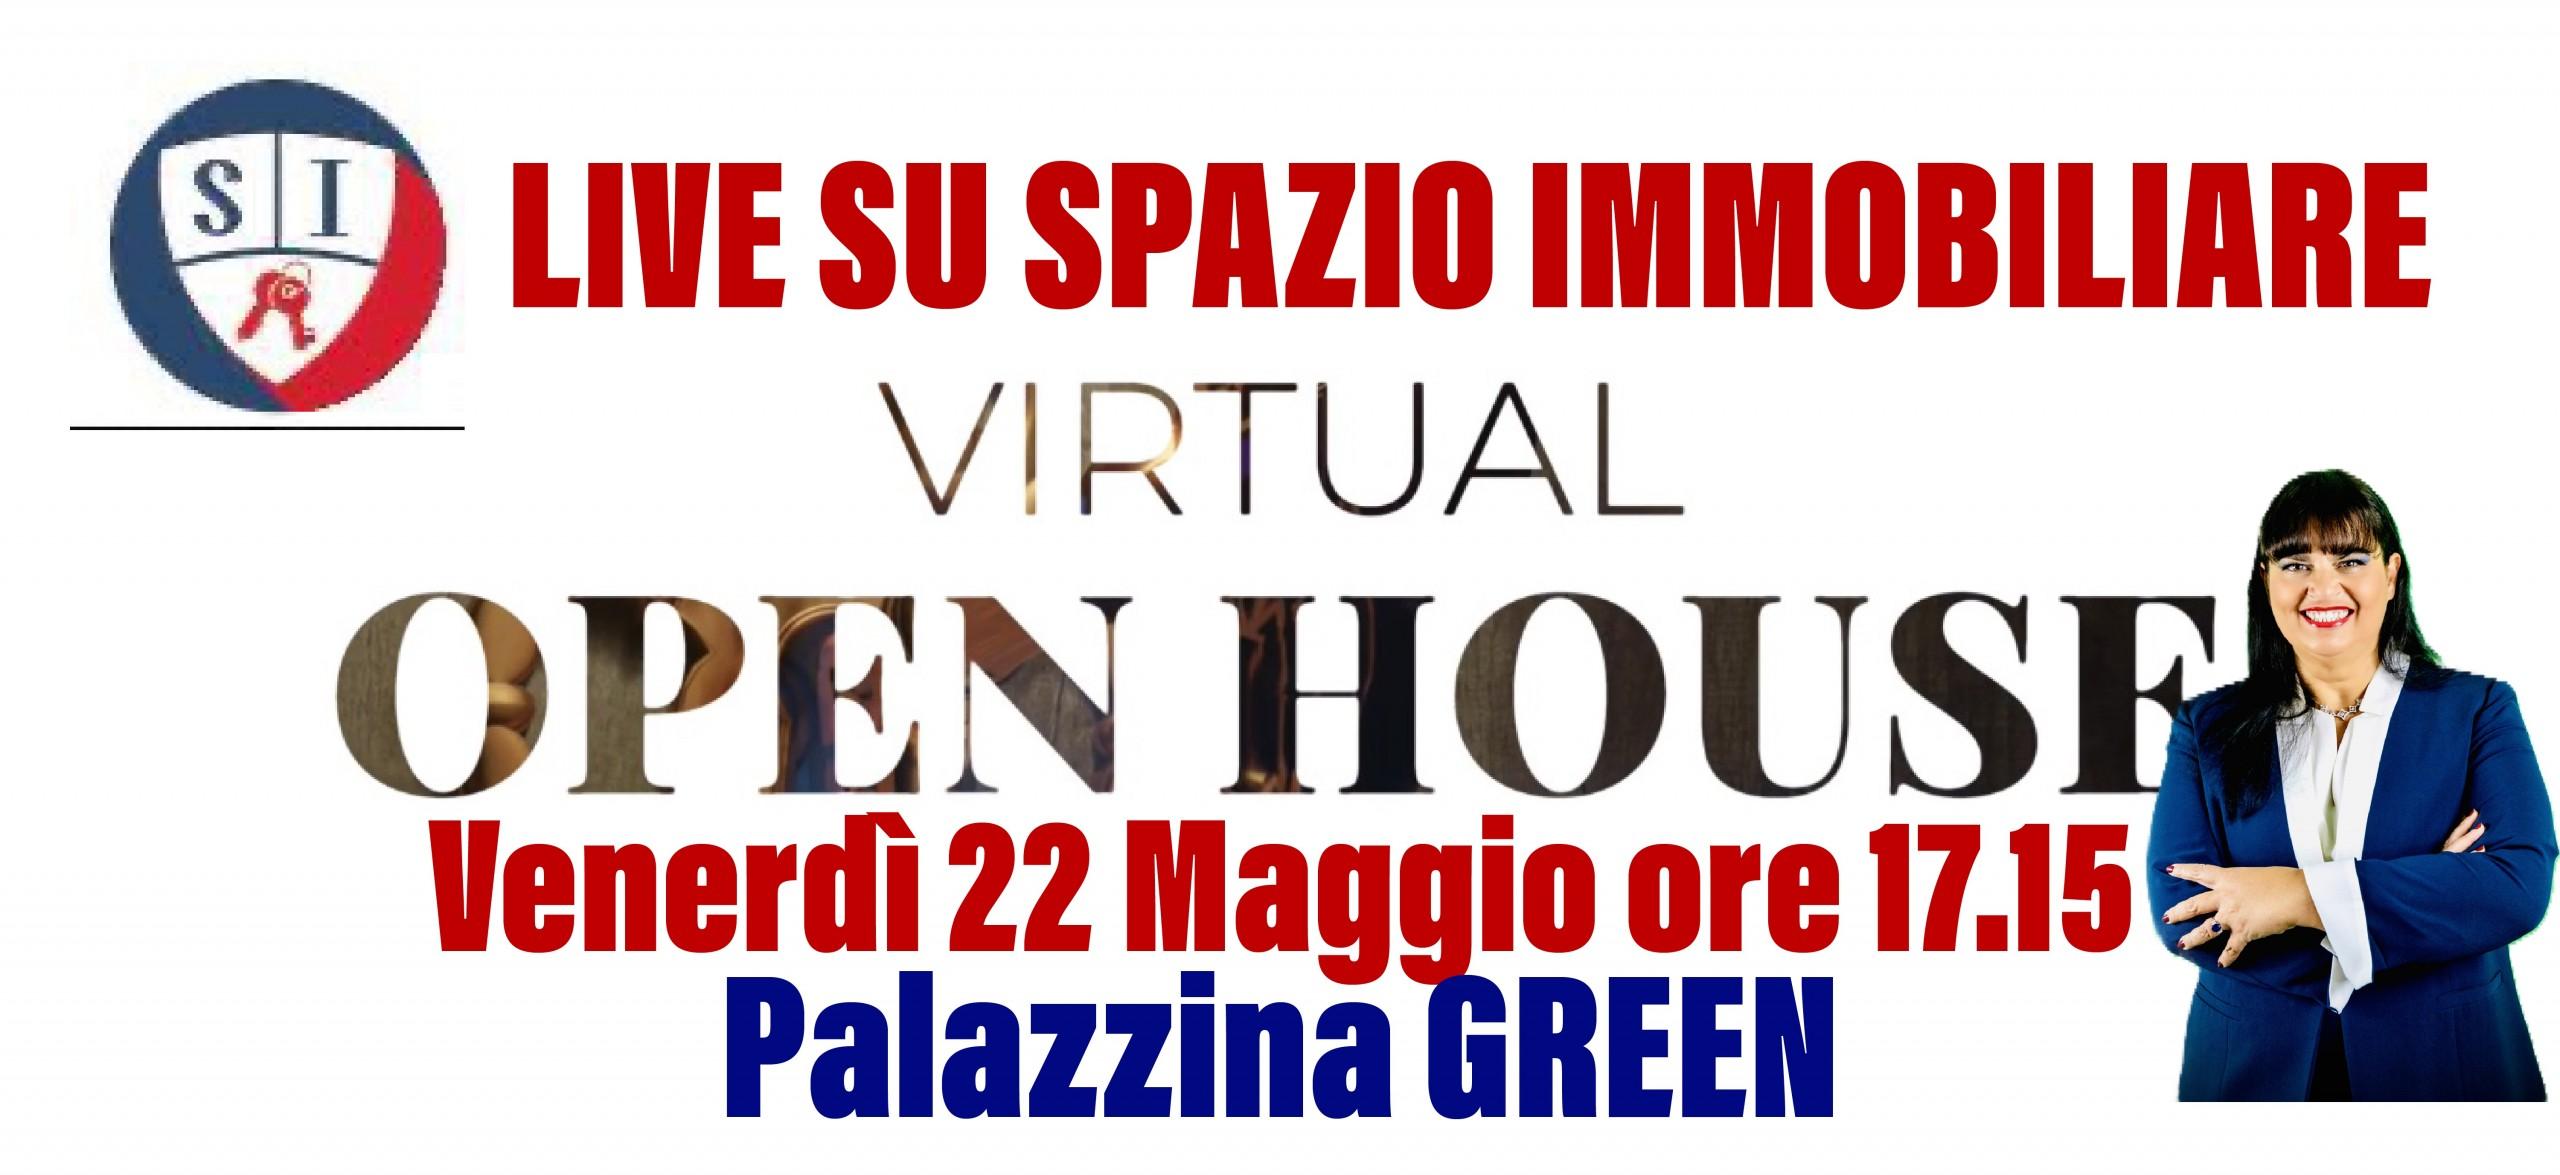 VIRTUAL OPEN HOUSE Palazzina GREEN